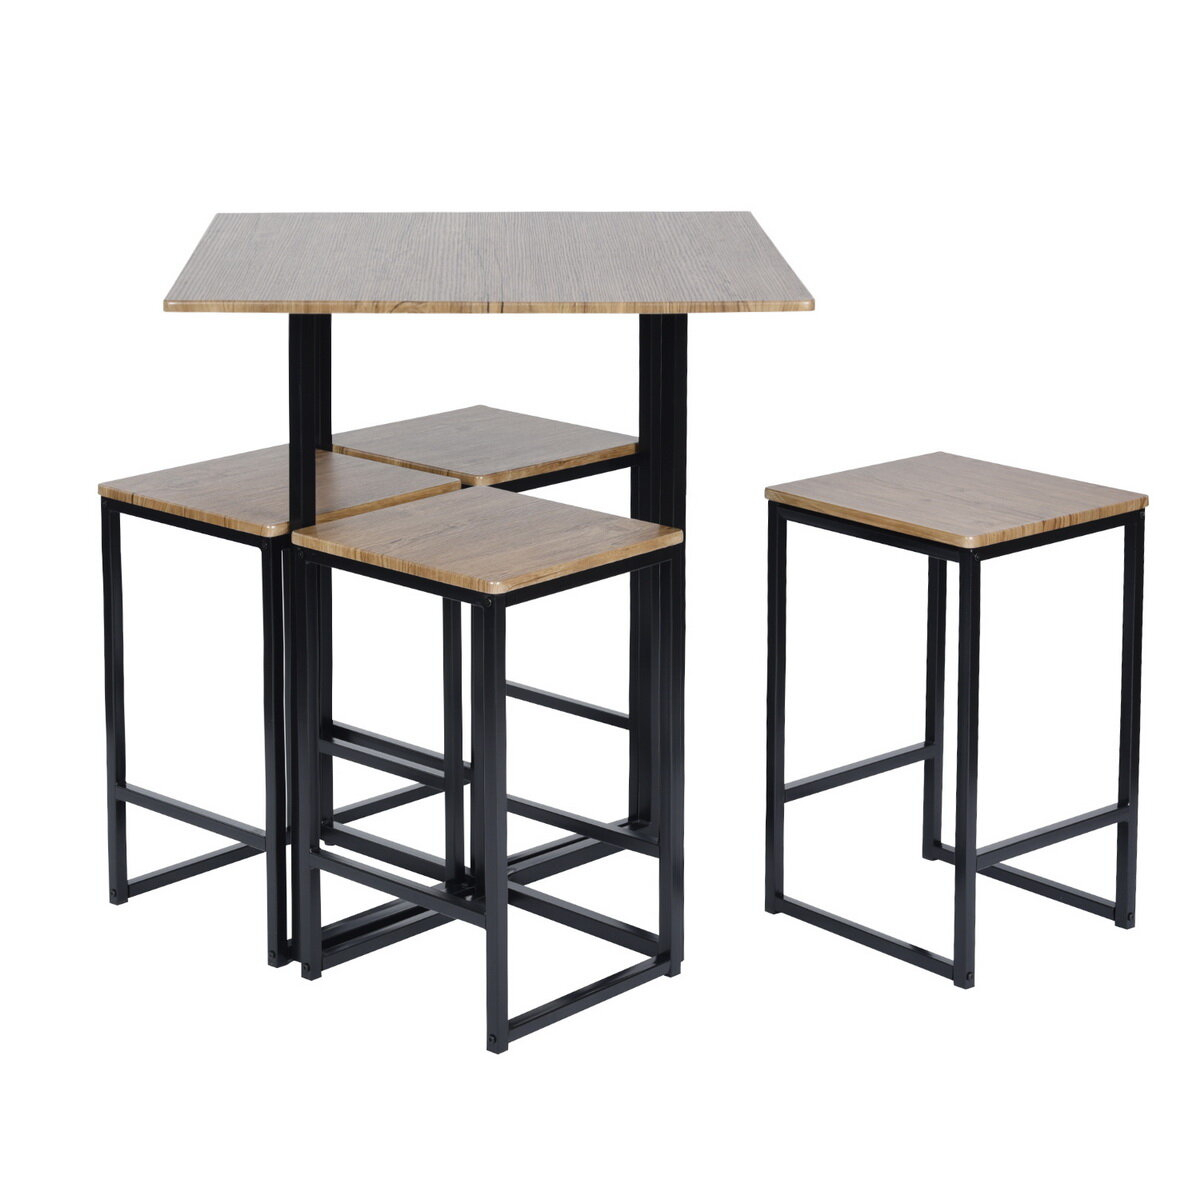 Malave 5 Piece Pub Table Set Regarding Most Current Partin 3 Piece Dining Sets (View 12 of 20)